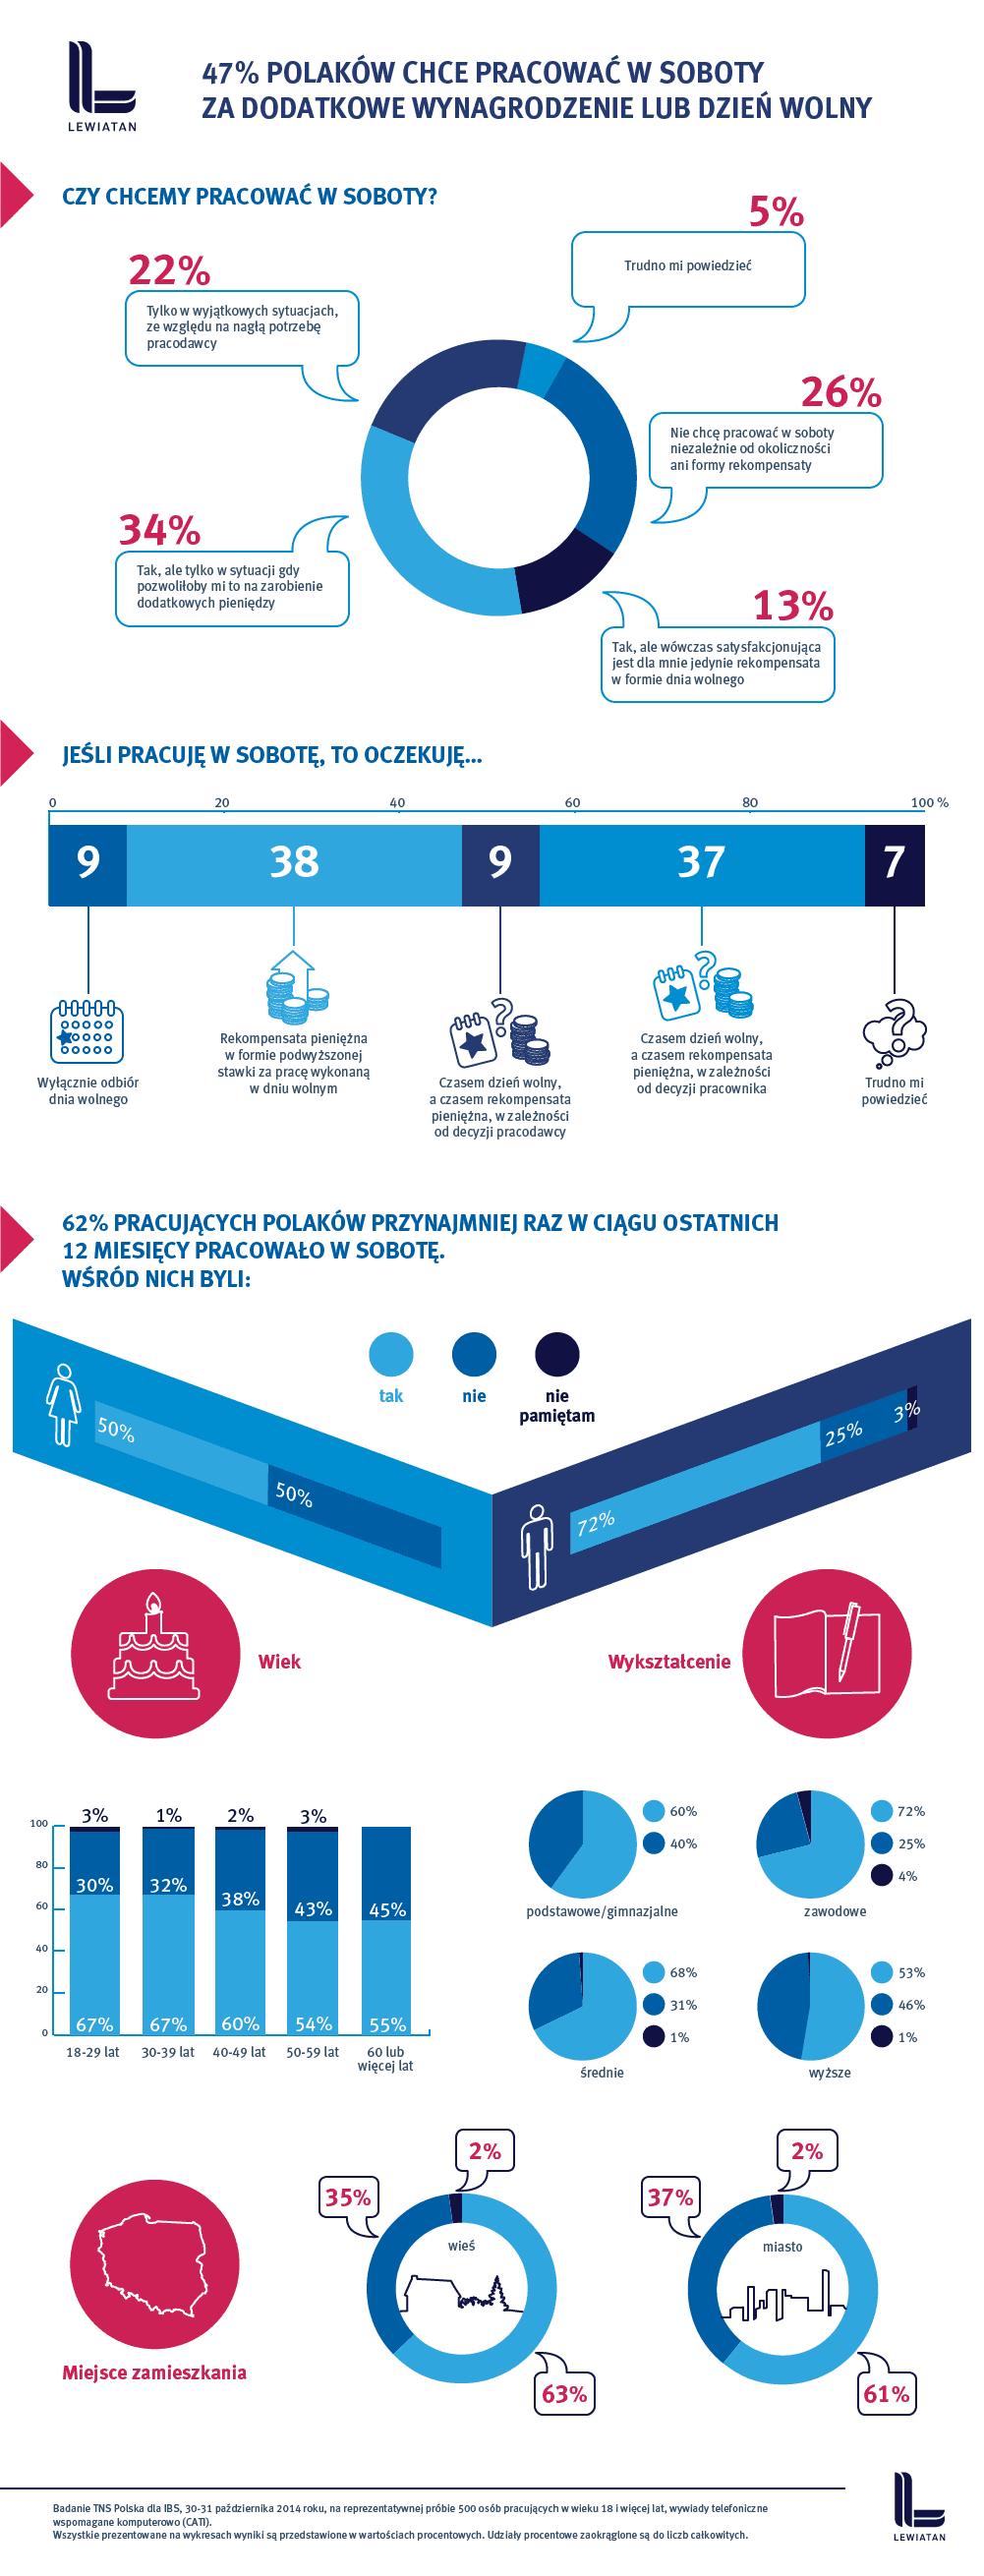 lewiatan_infografika_poprawki3-03